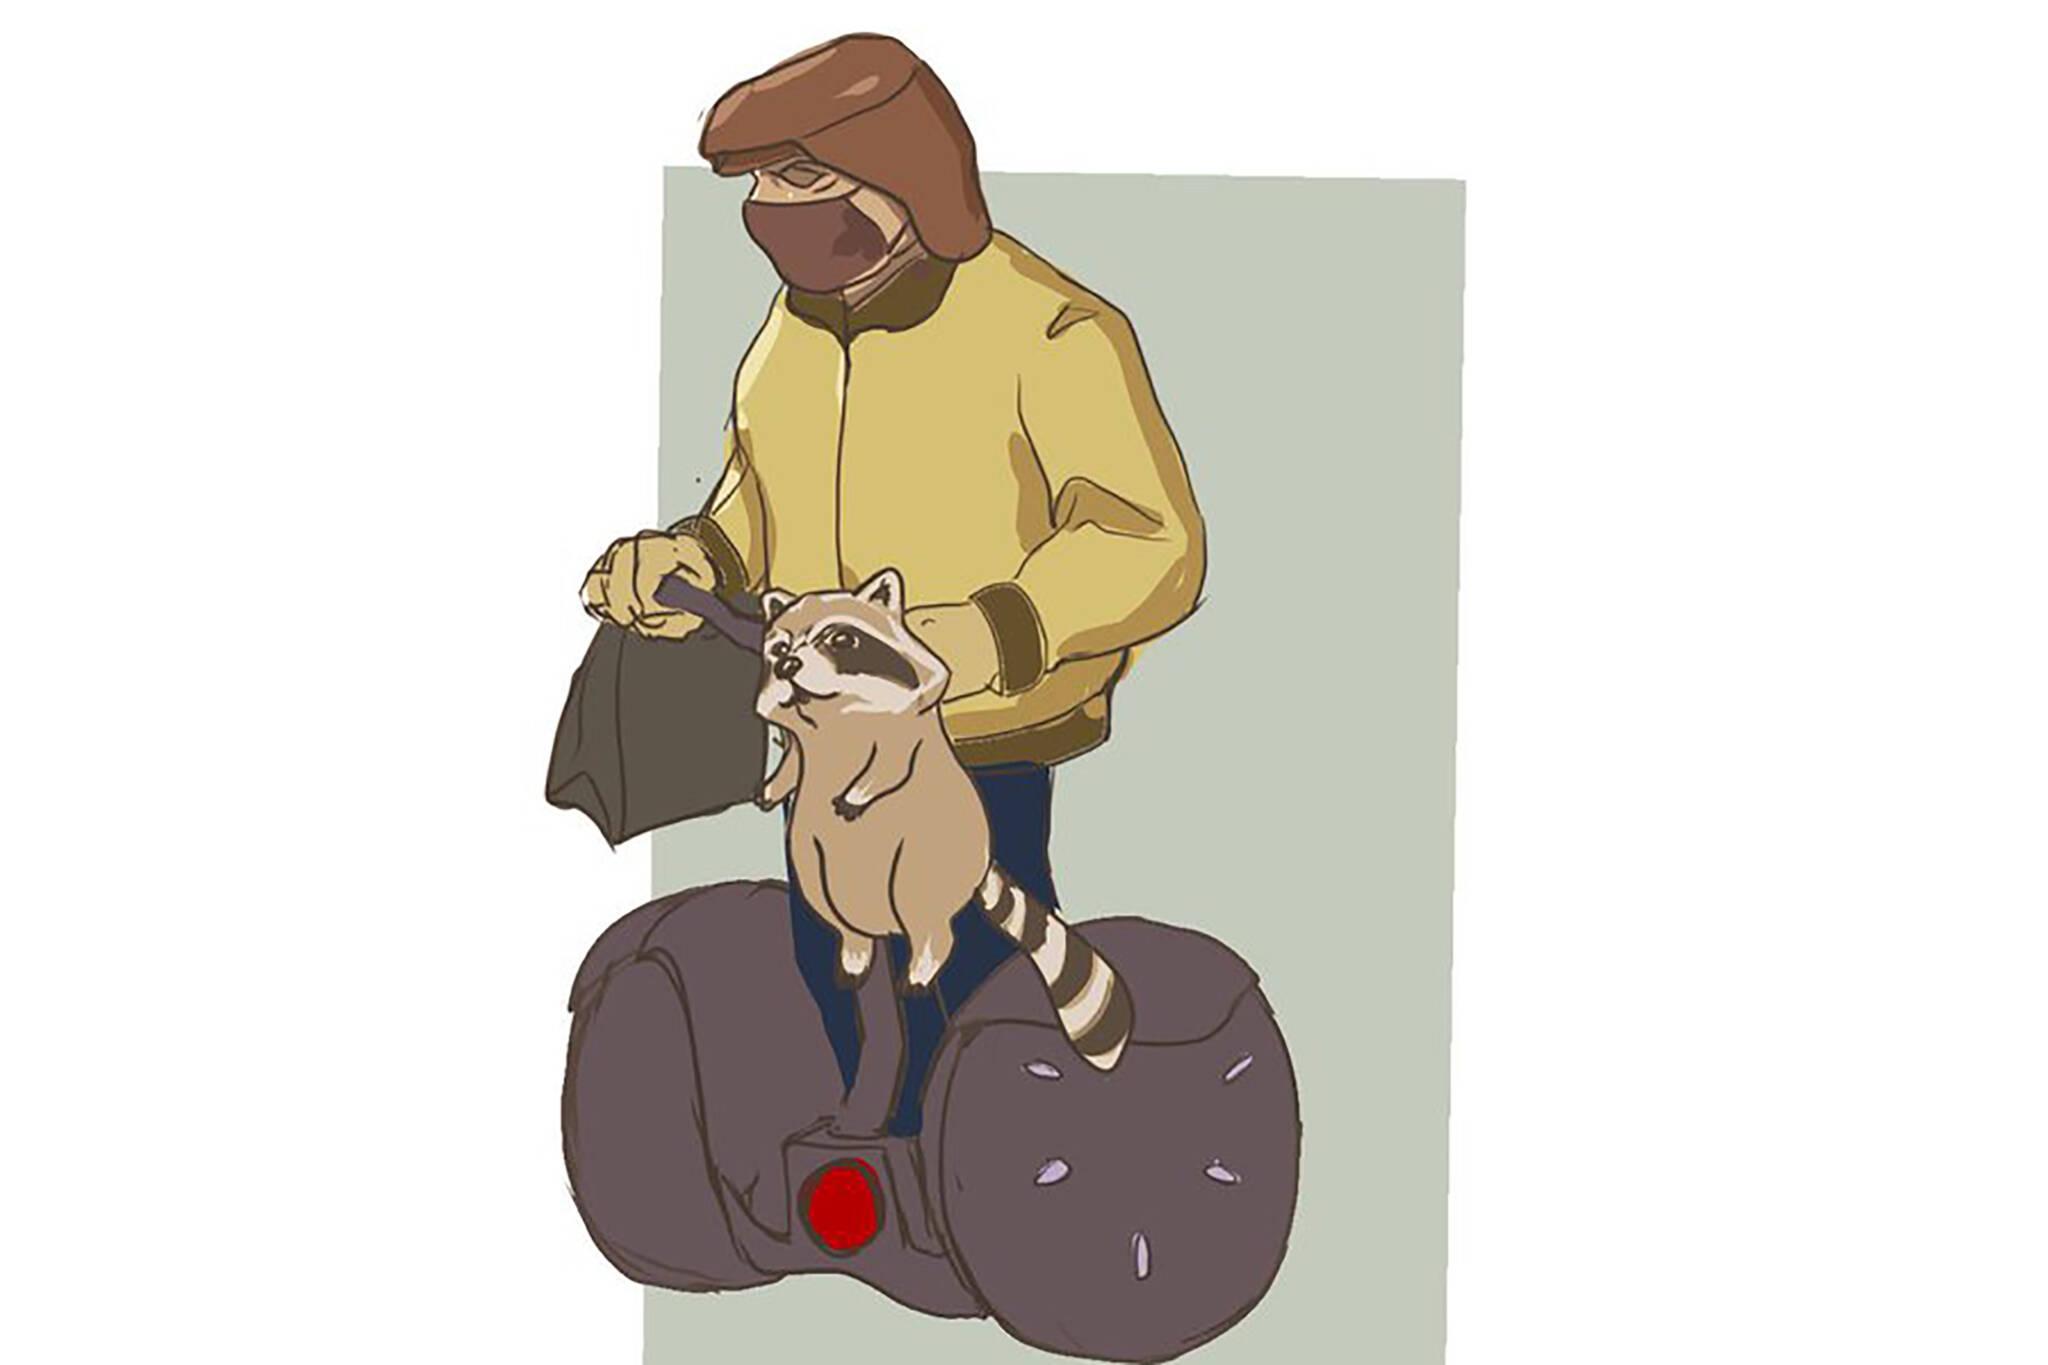 segway raccoon toronto